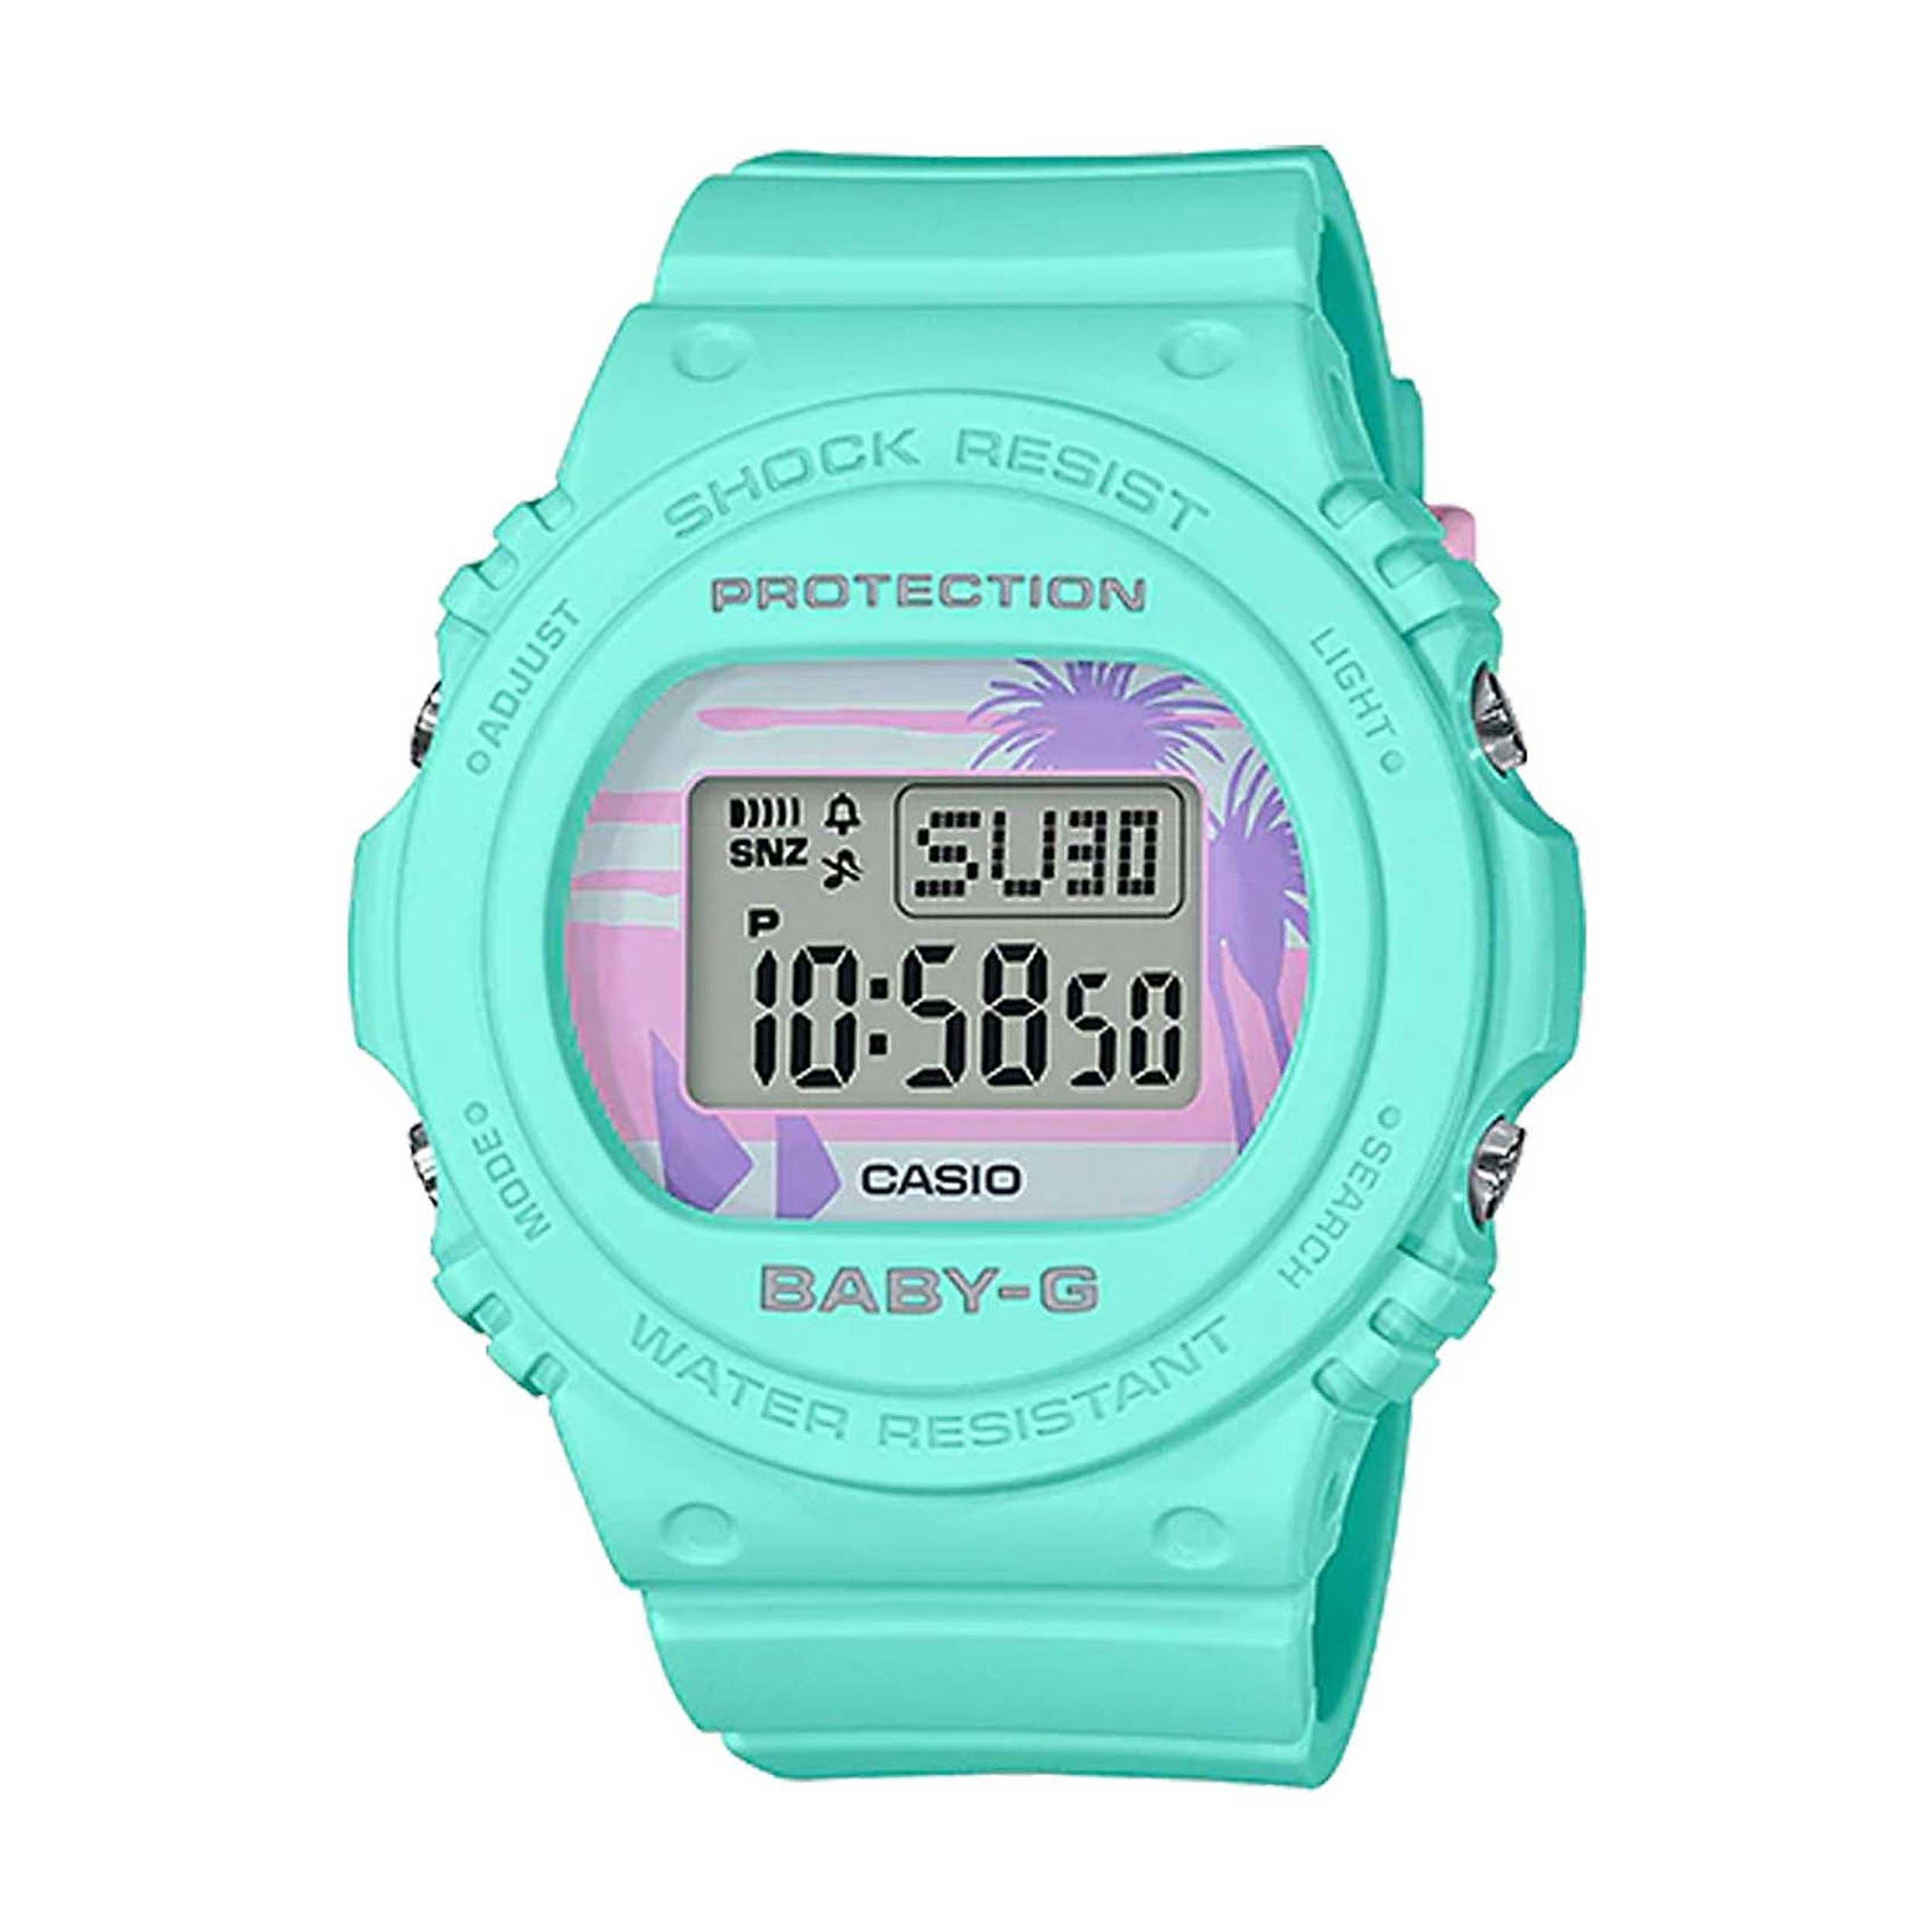 ساعت مچی دیجیتال زنانه کاسیو مدل BGD-570BC-3DR